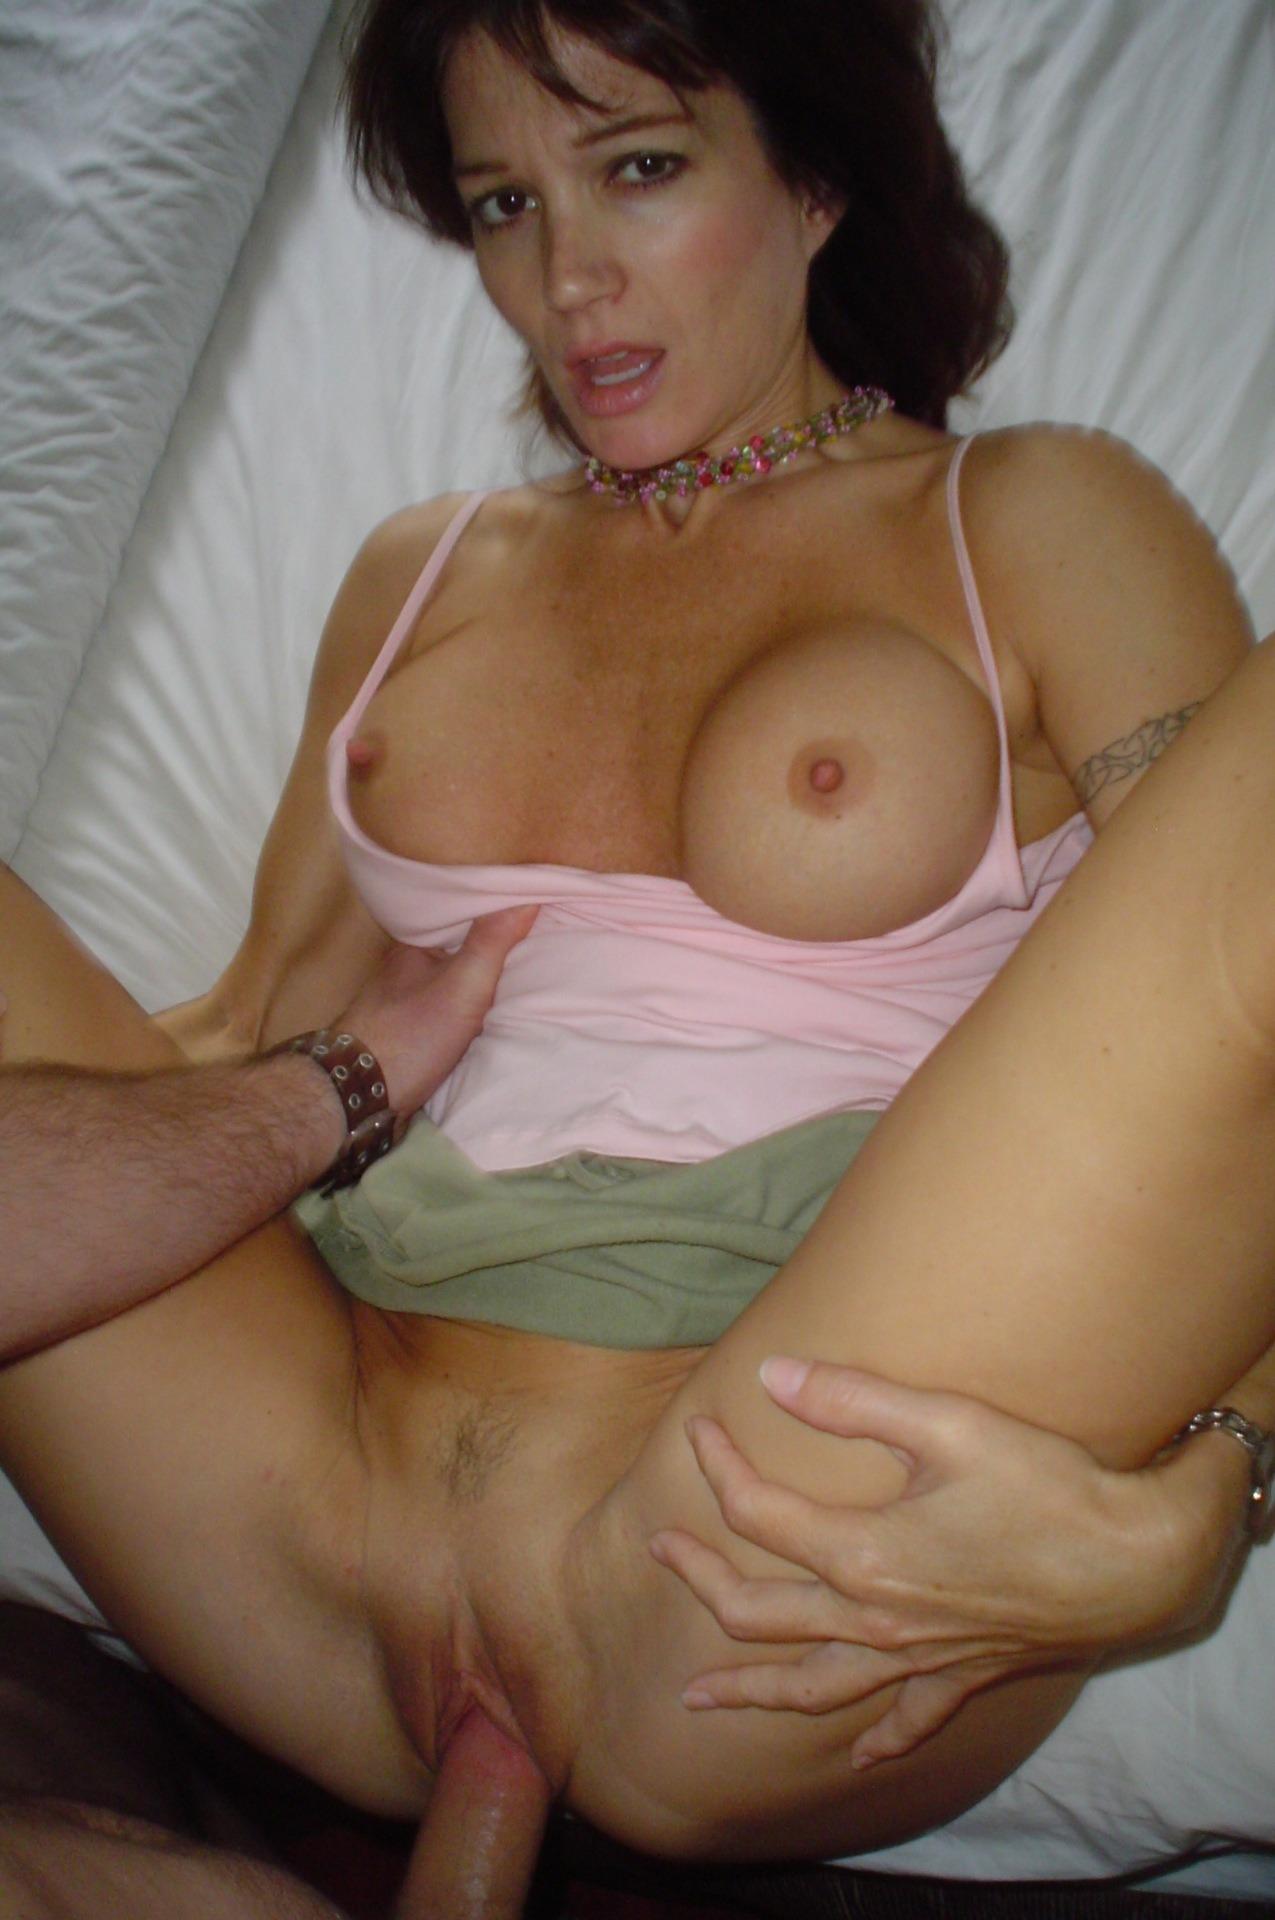 big booty white girls porn com nude fucking